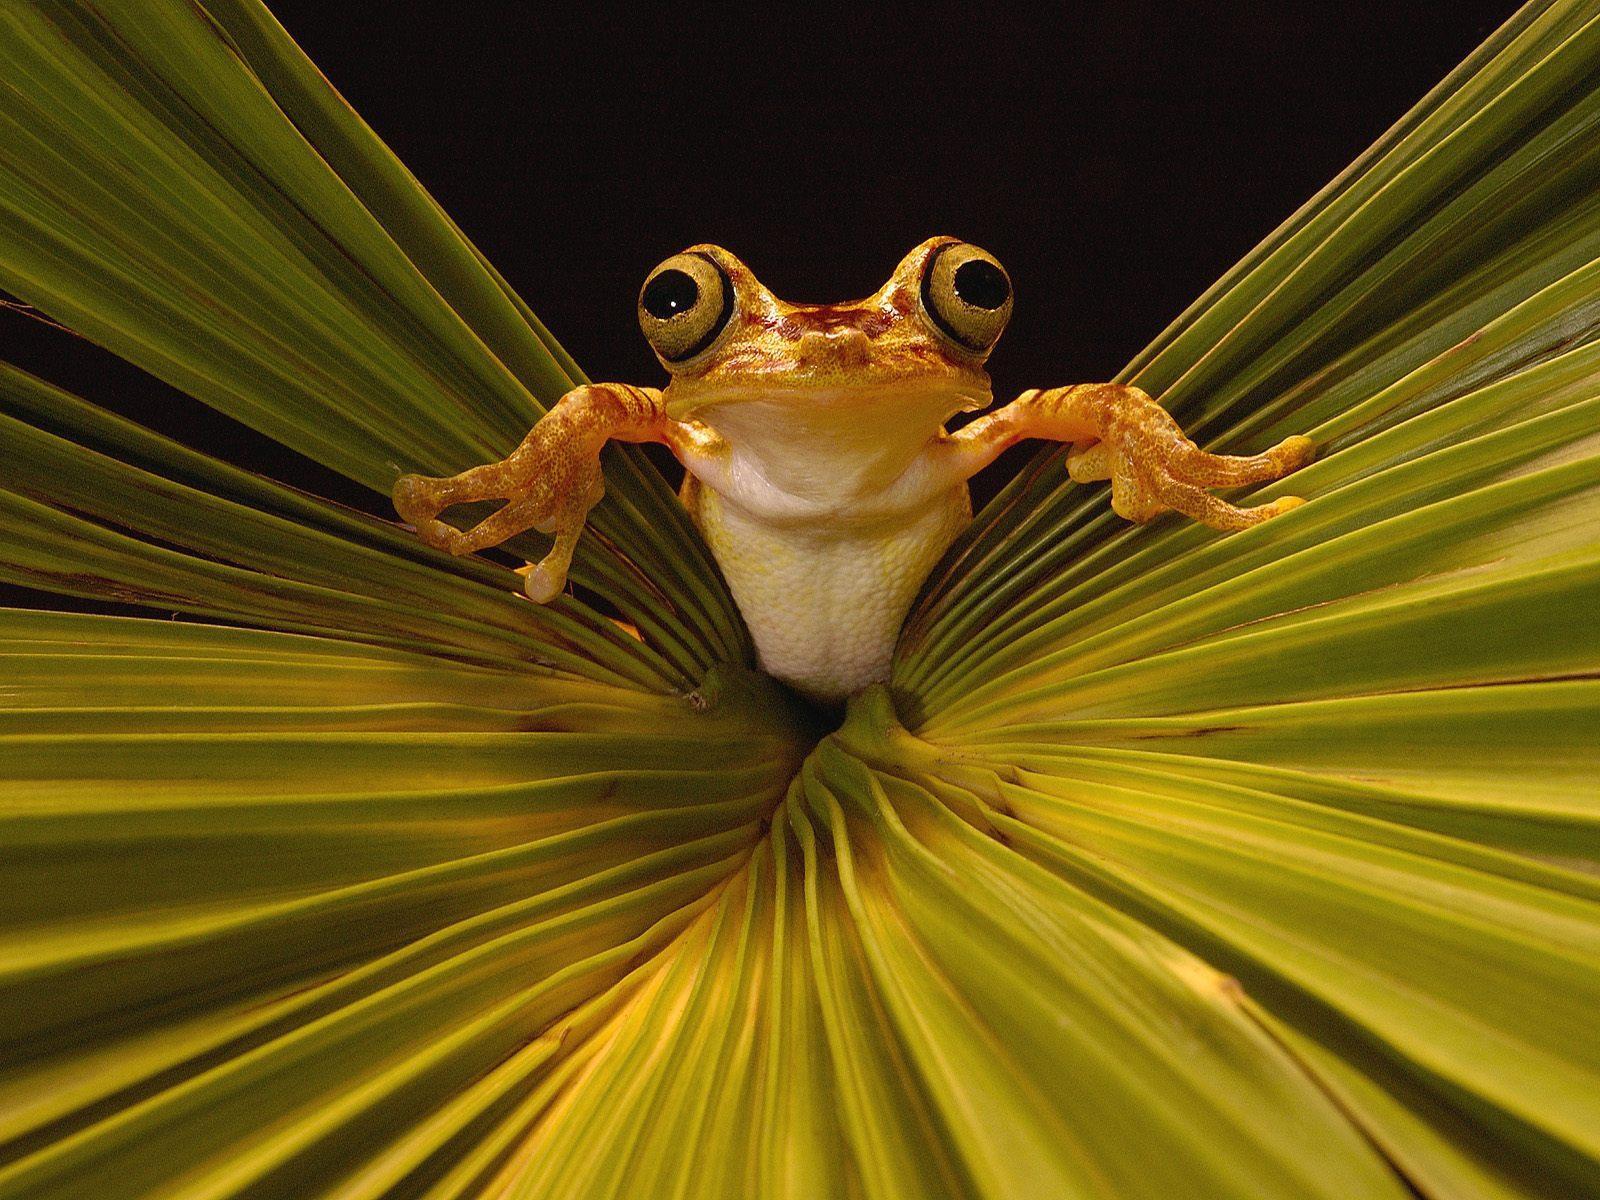 http://4.bp.blogspot.com/_3zkyrfijNIM/TFJnS5lkLaI/AAAAAAAAAgw/4rF0pUk9JSk/s1600/tree_frog_rainforest.jpg